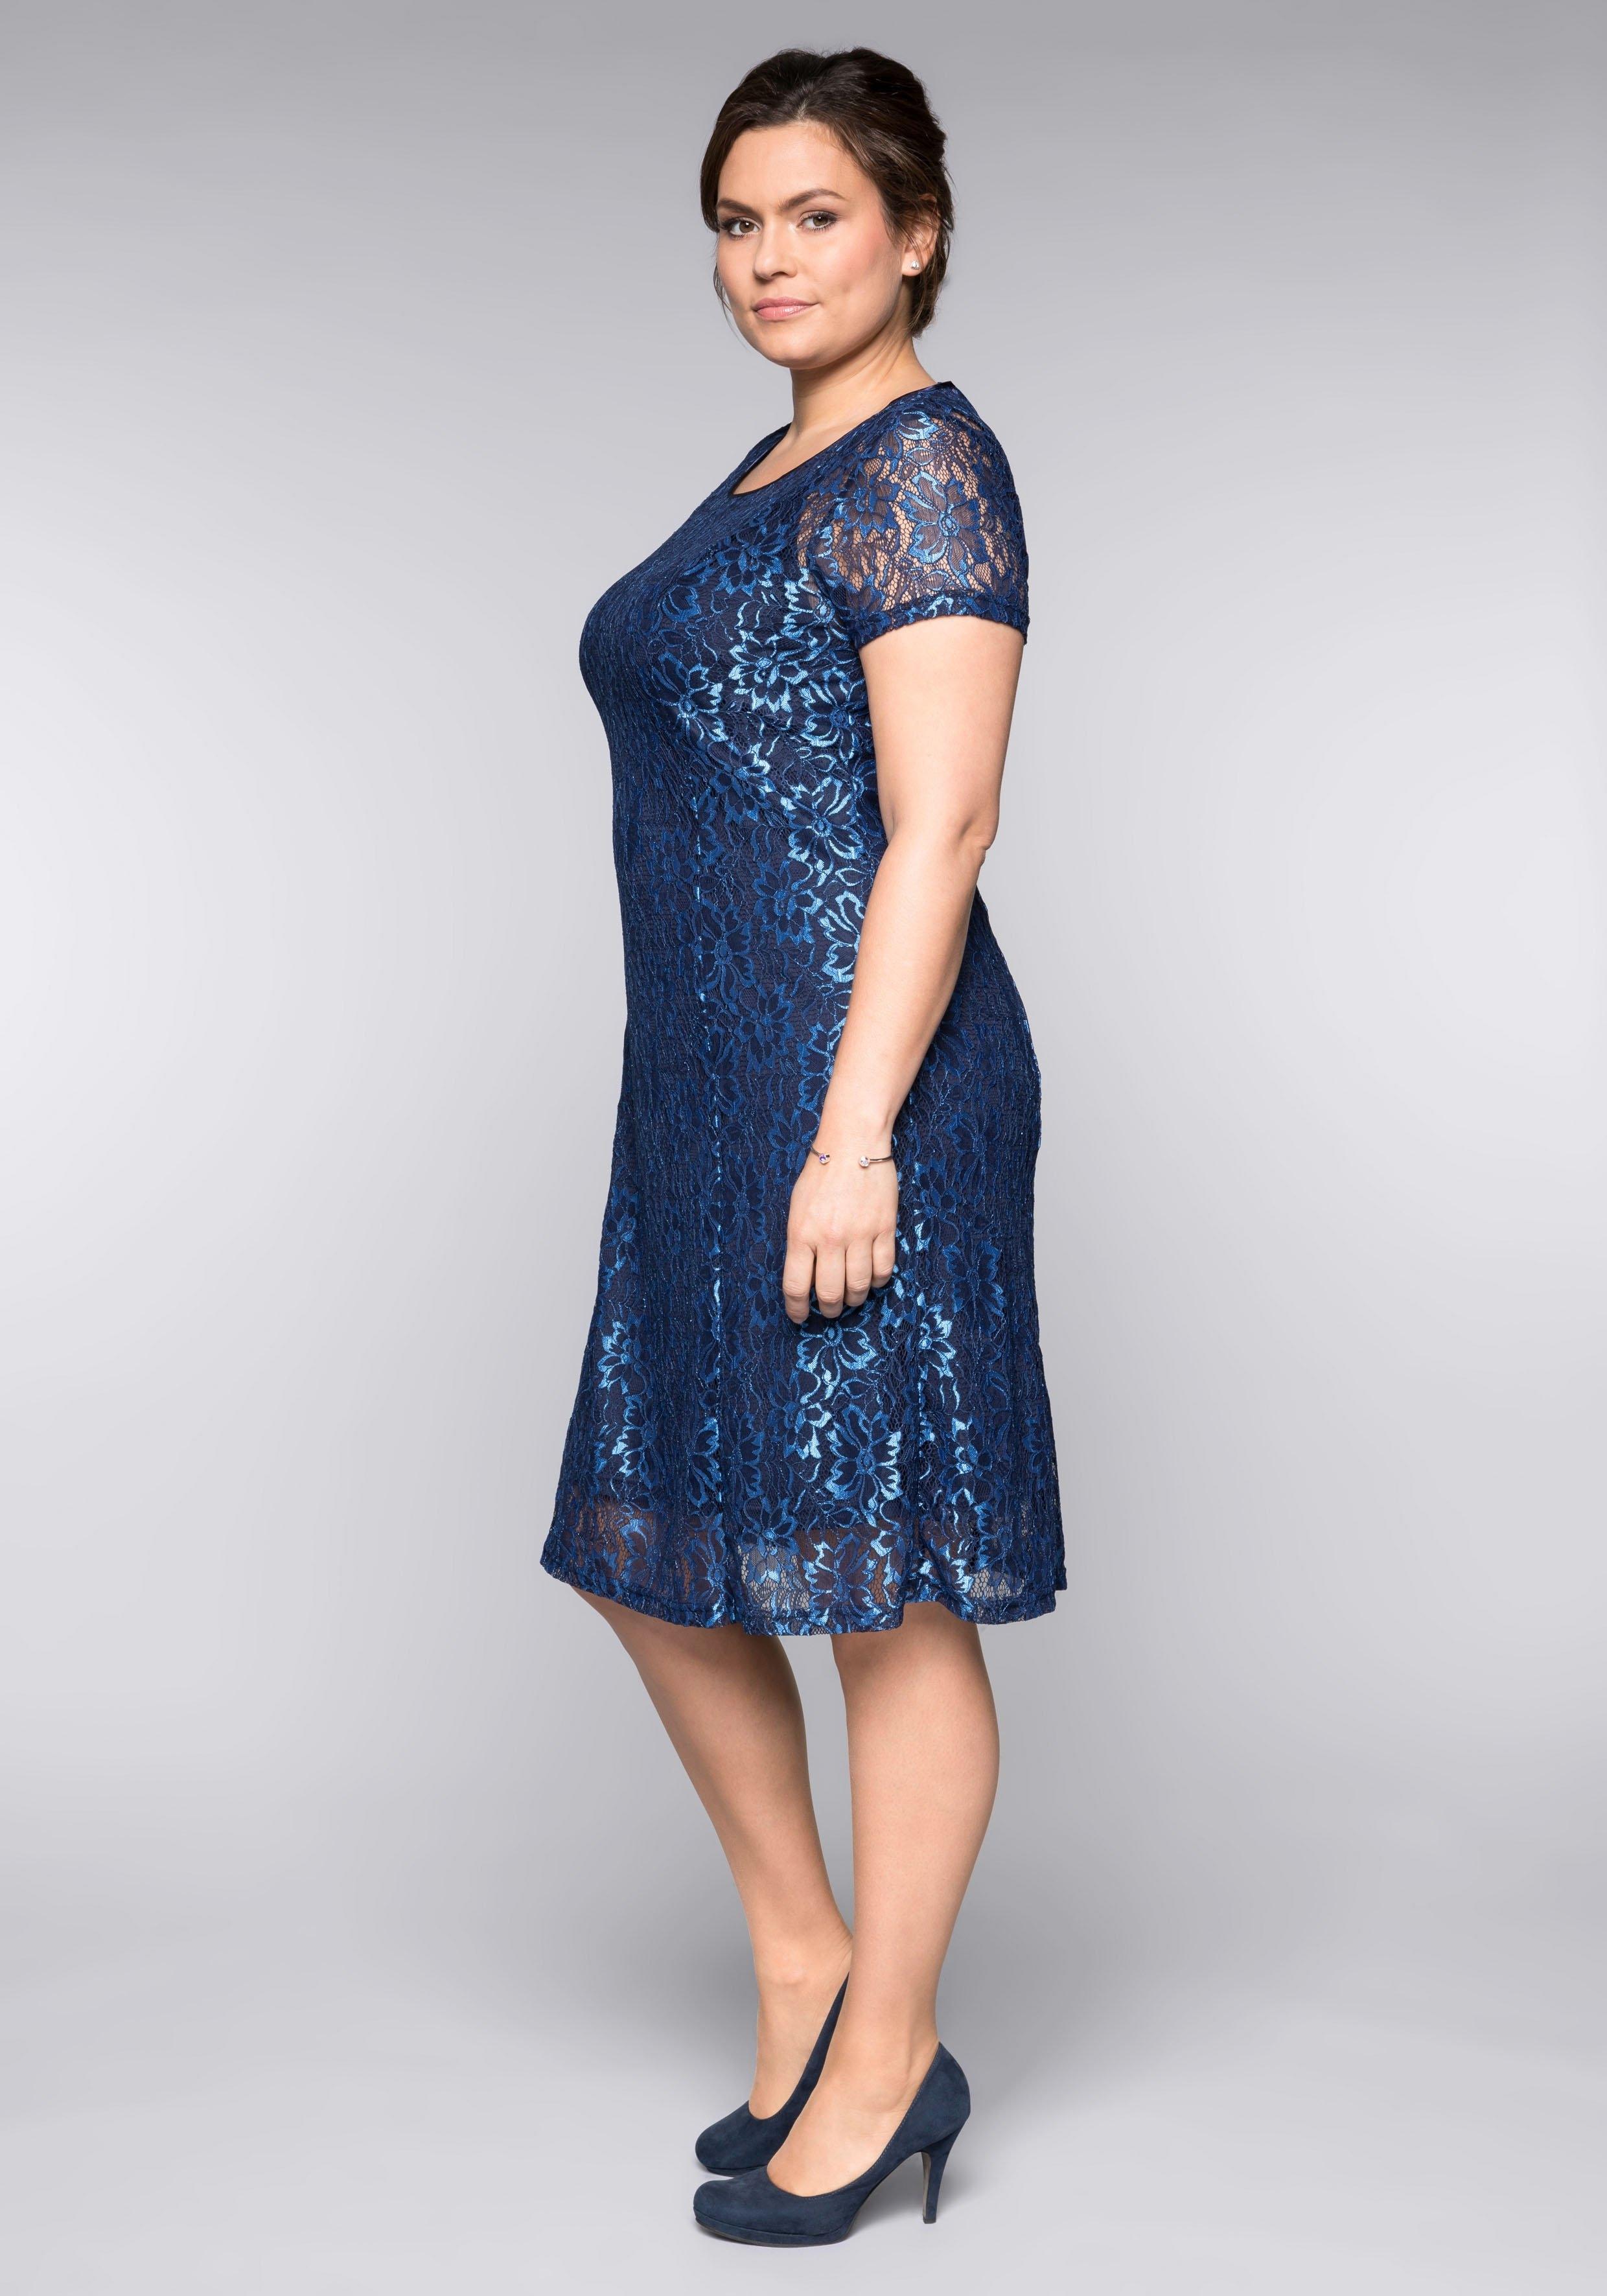 Wonderbaar Sheego kanten jurk makkelijk besteld   OTTO BJ-65